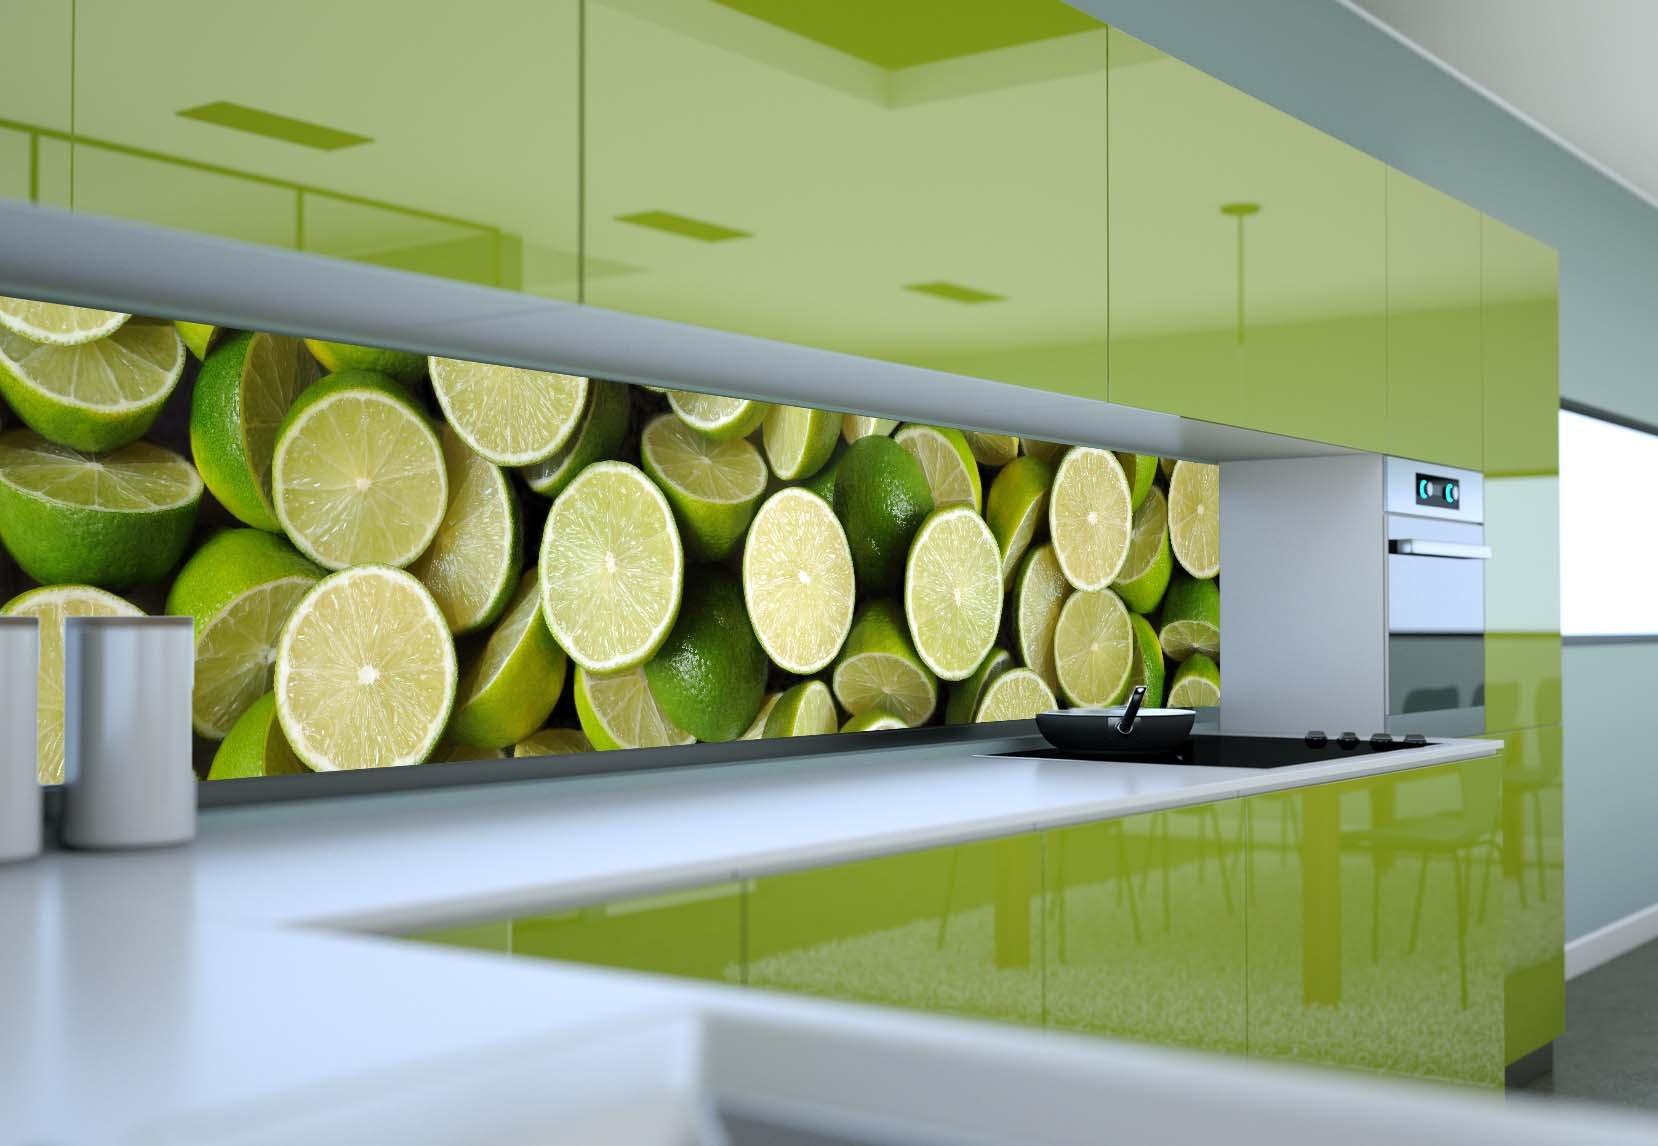 Panel szklany do kuchni POŁÓWKI LIMONEK  Magic & Style -> Kuchnia Leroy Merlin Limonka